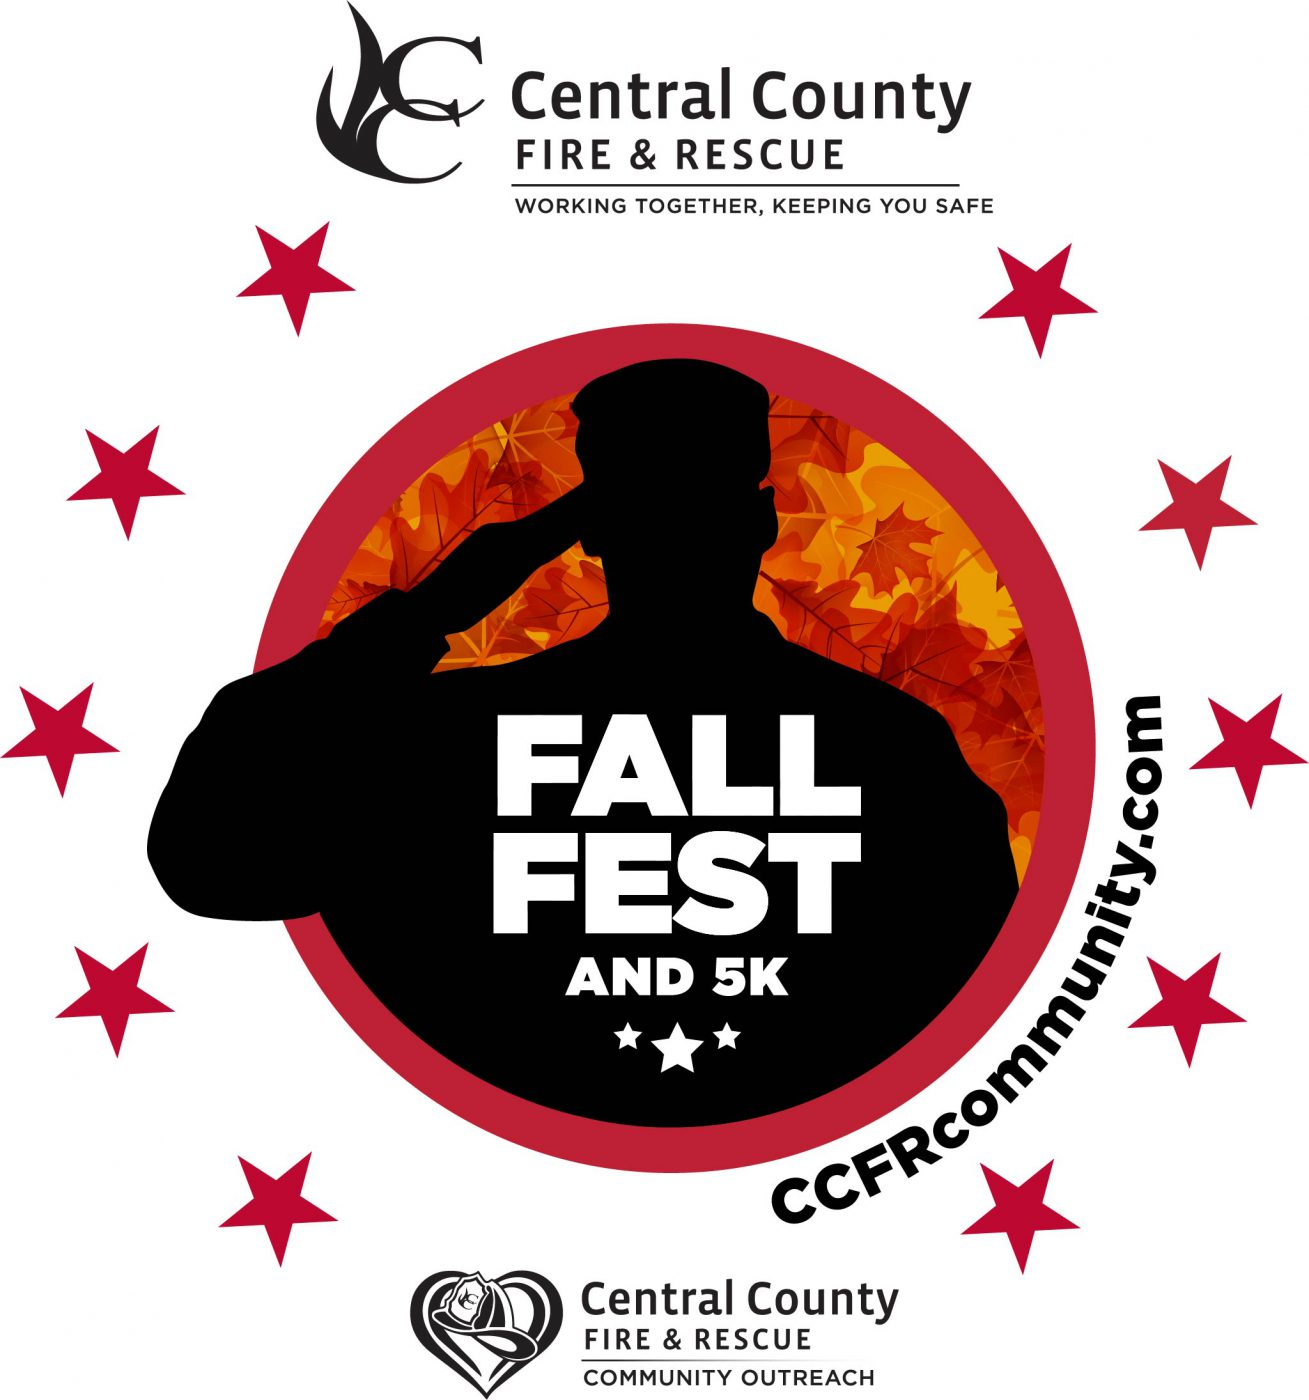 2021 Fall Fest & FK